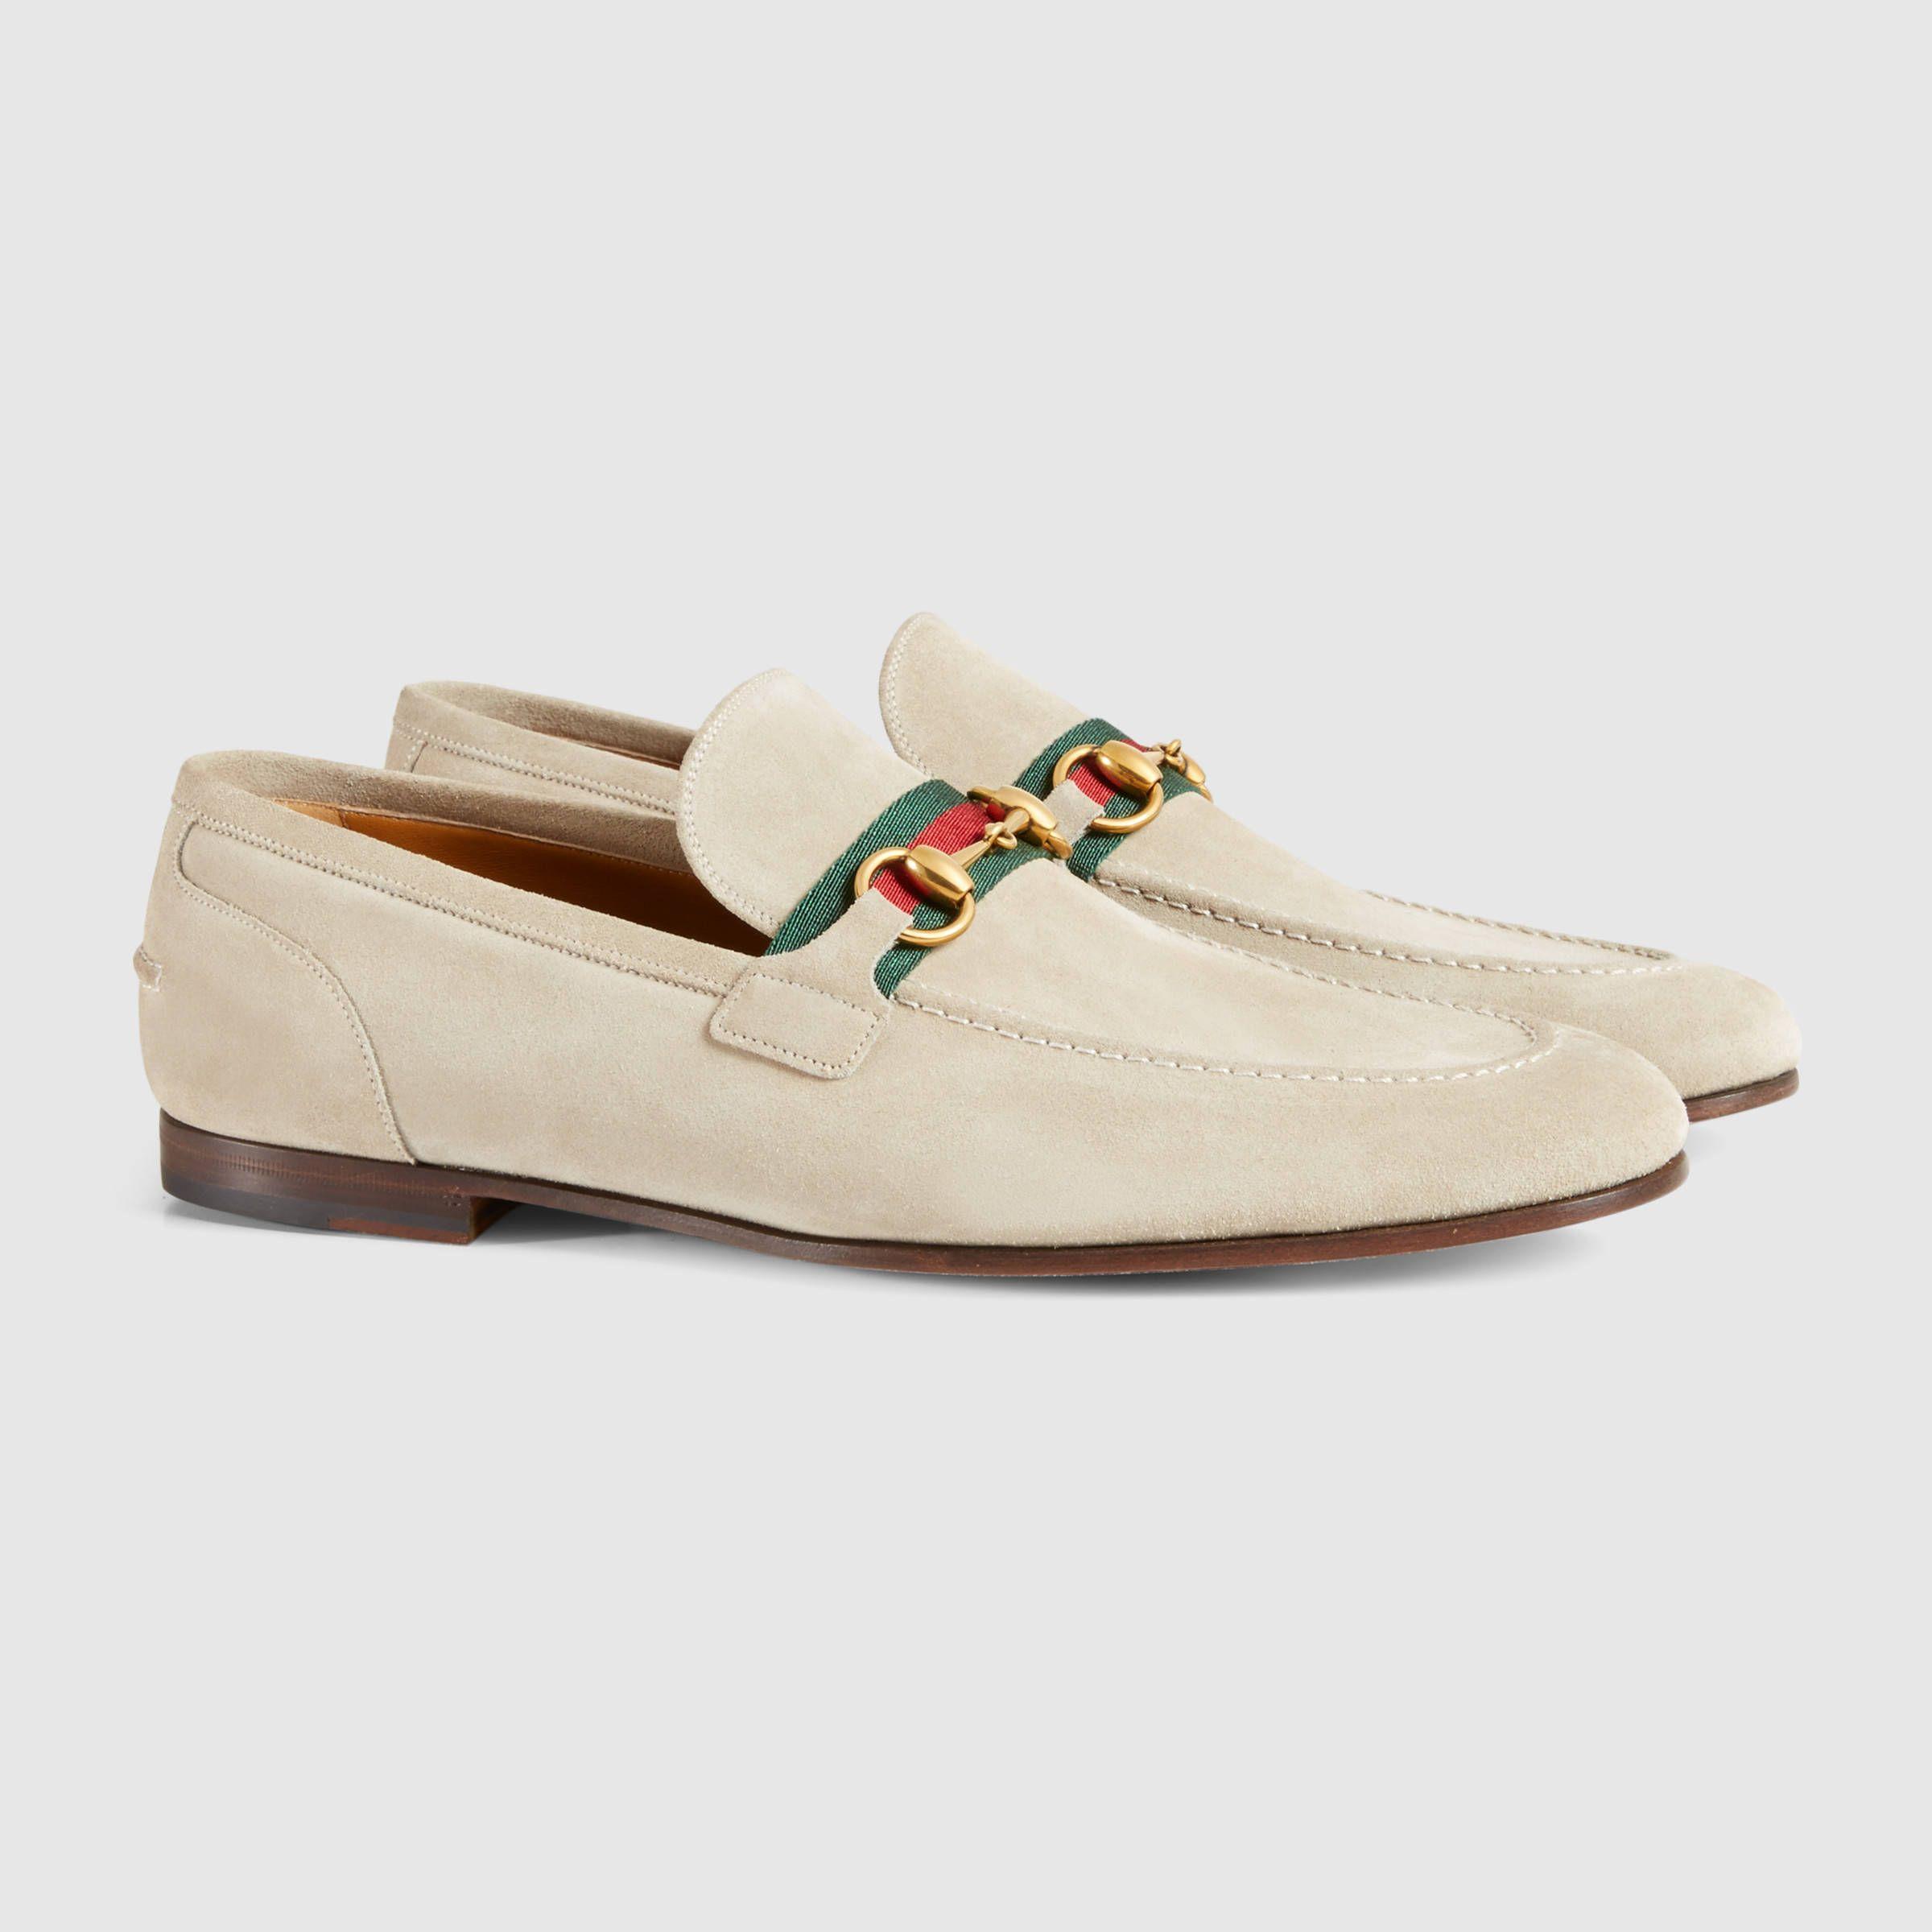 05e69034705 Gucci Men - Horsebit suede loafer with web - 322500CMA409560 ...